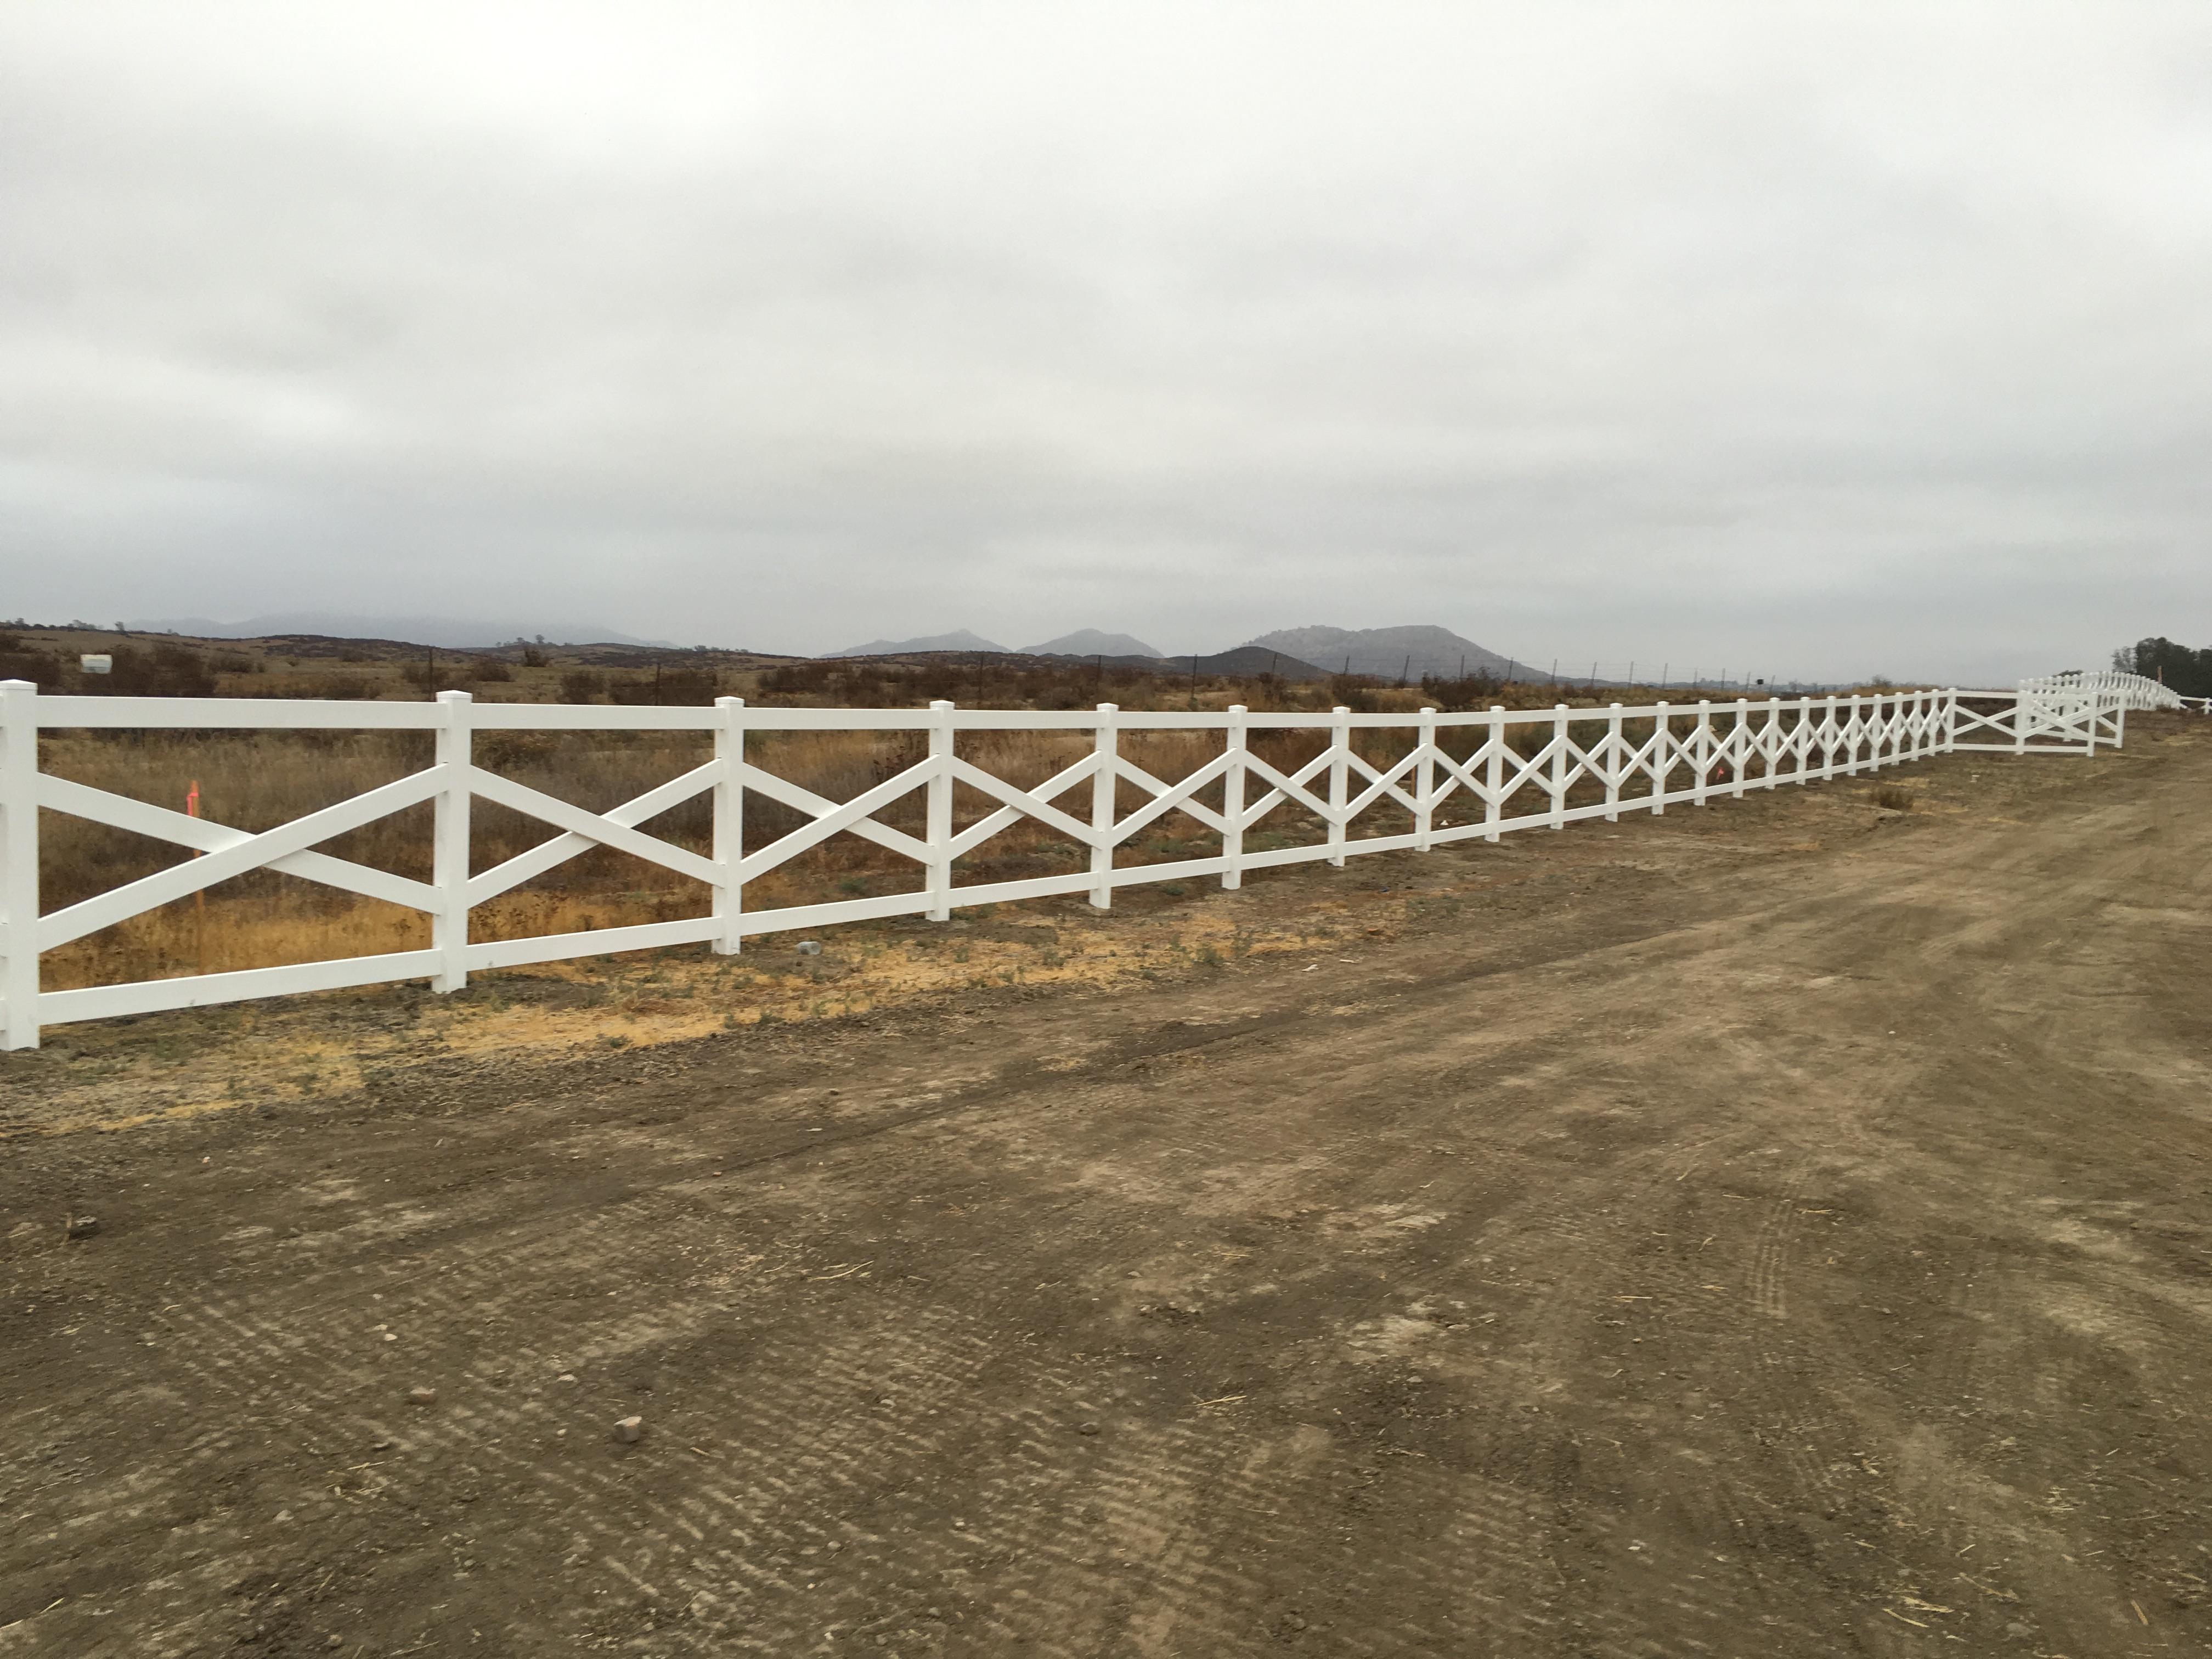 3T Fence image 23